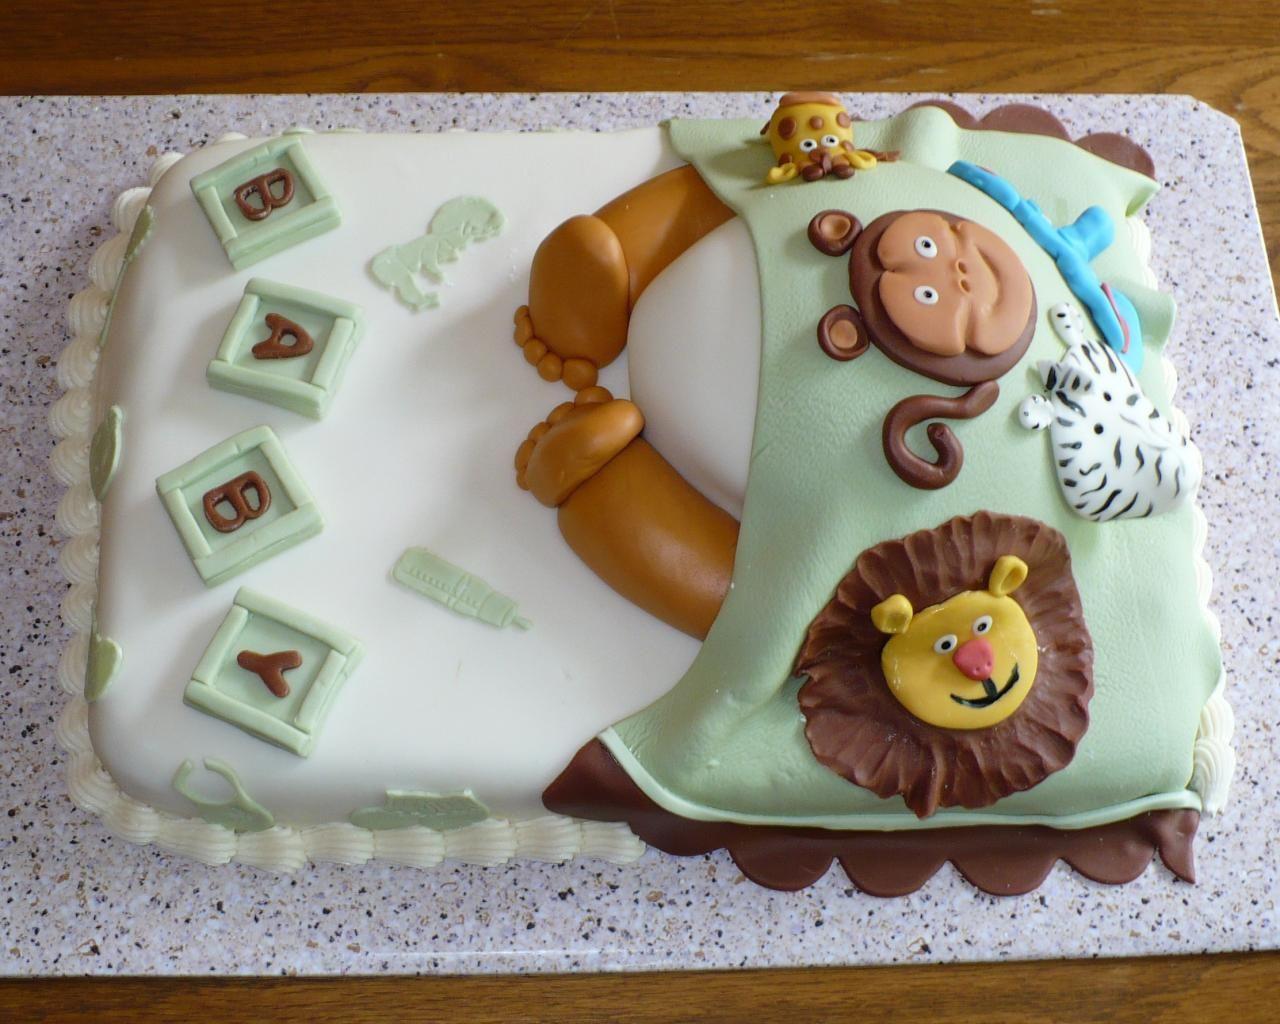 Baby Shower Cake Ideas Zoo Animals ~ Zoo animals baby shower cake animal cakes animal